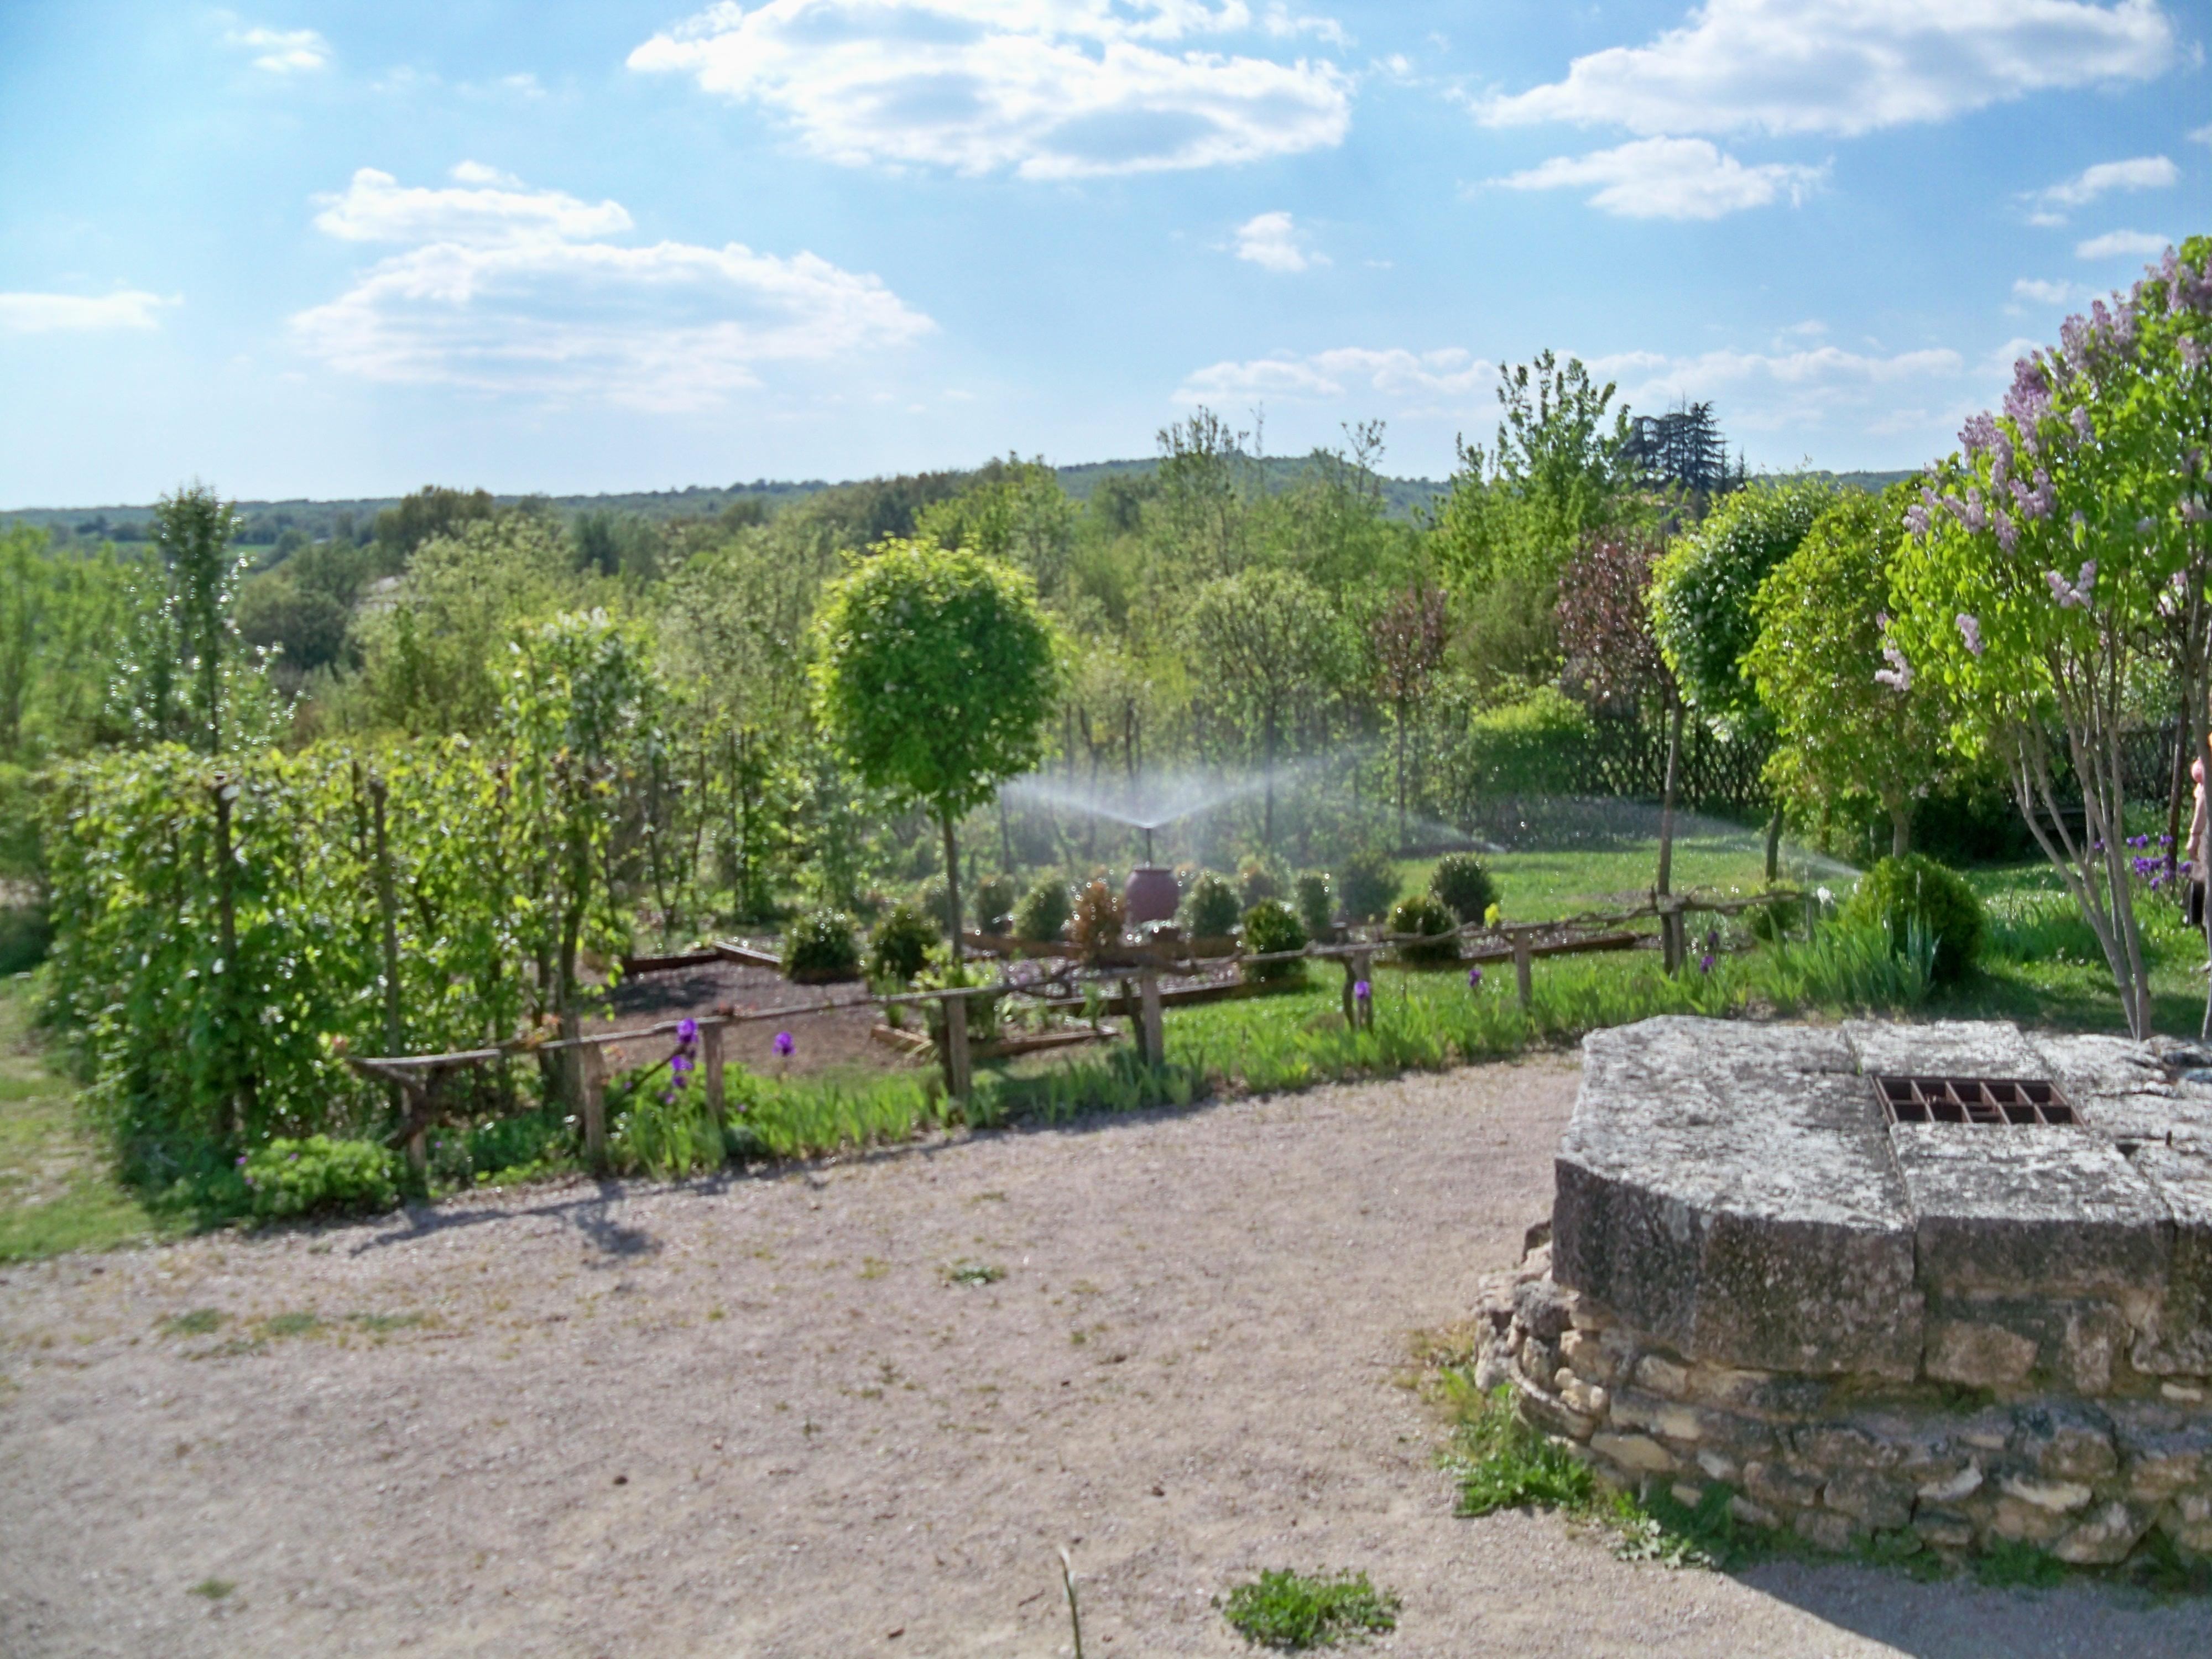 File:Mane - Prieuré de Salagon, jardin moderne.jpg ...